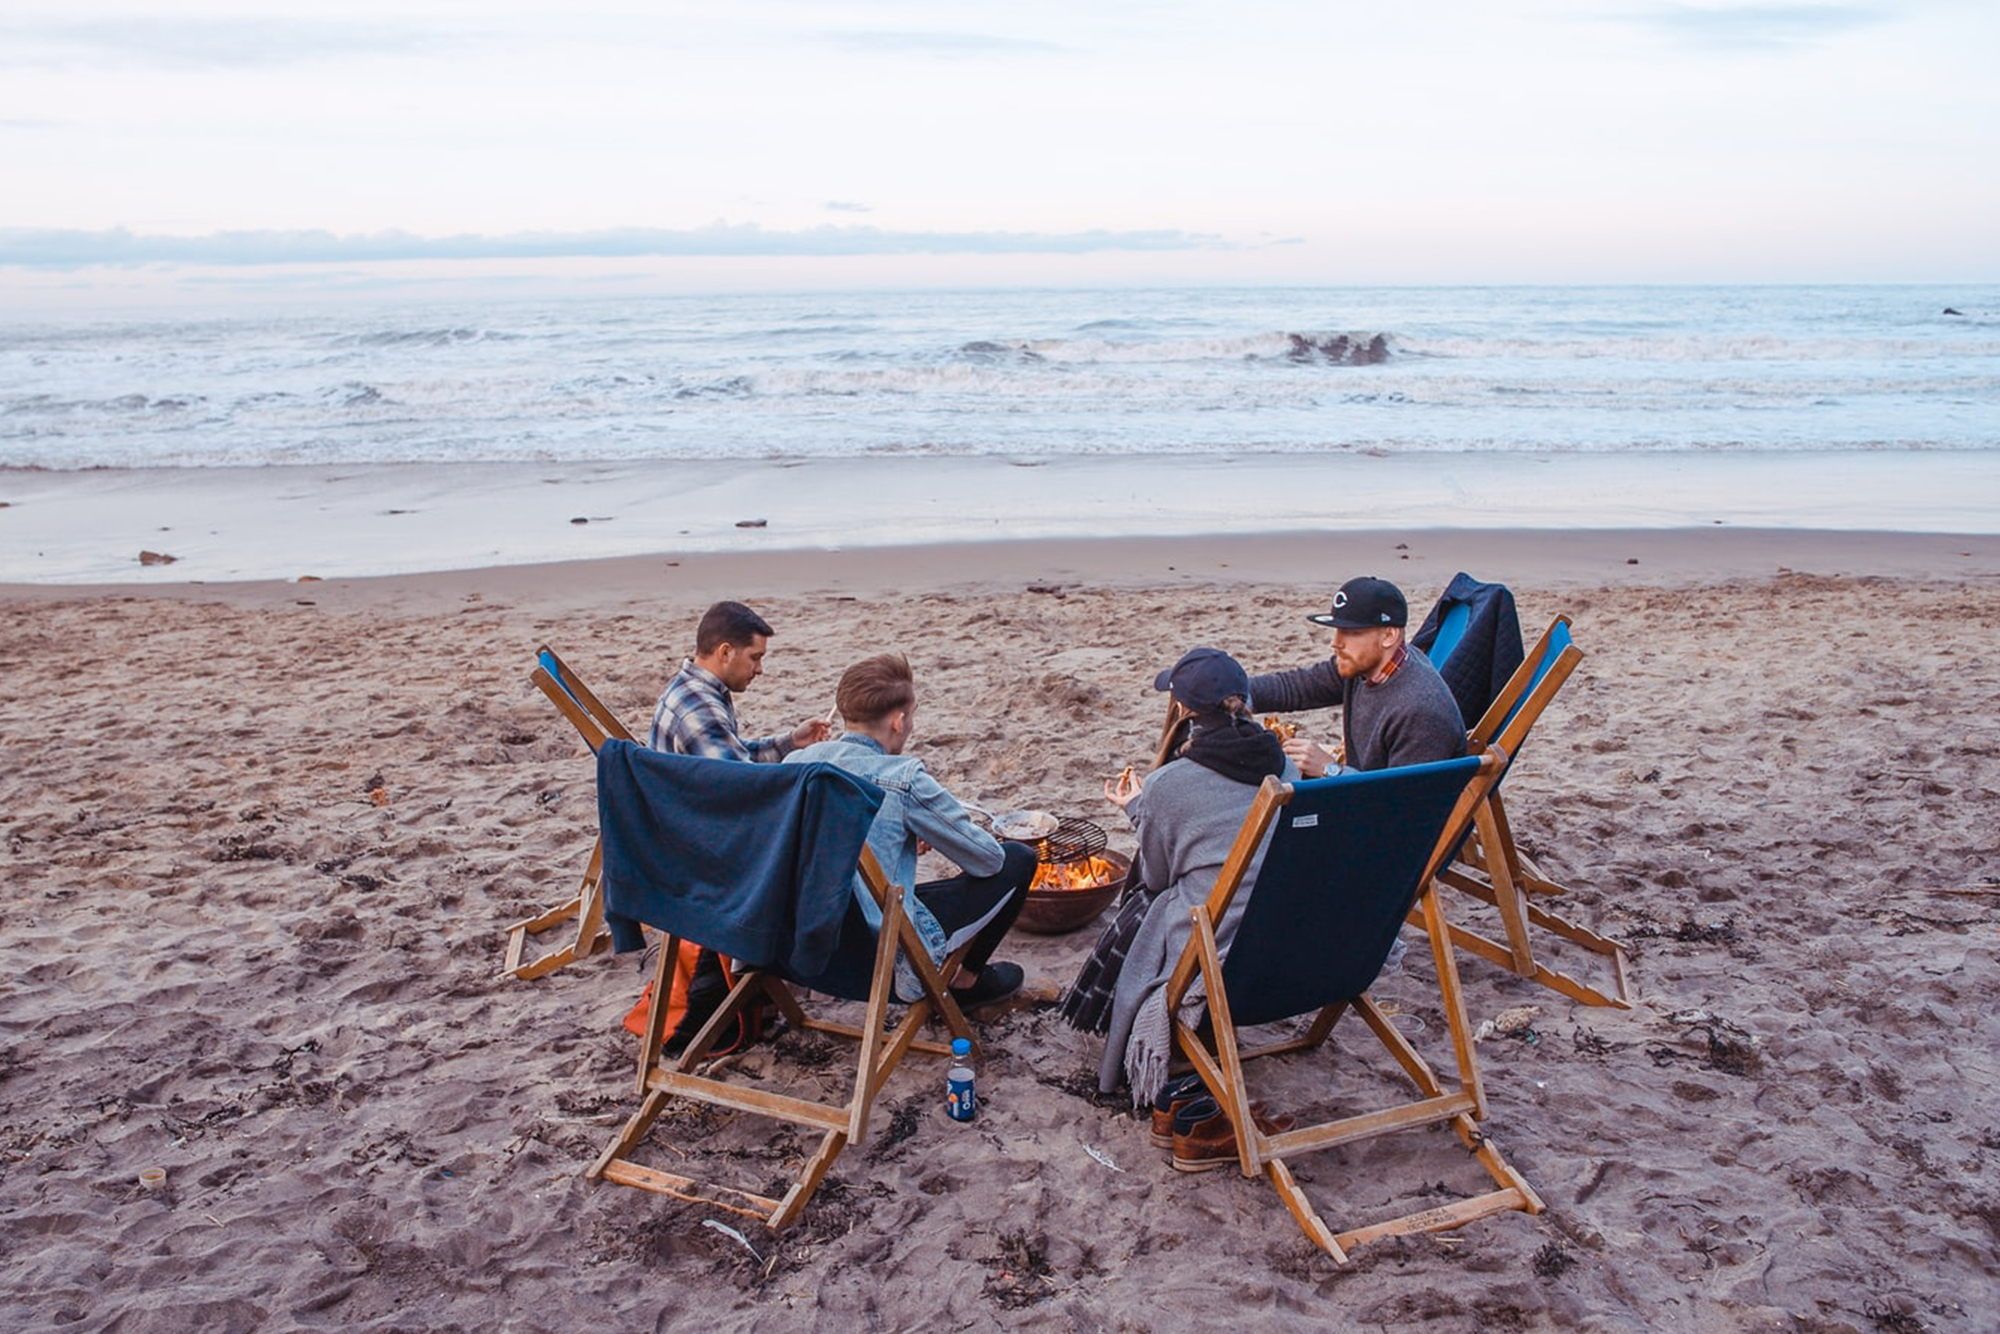 Friends sitting around a beach bonfire